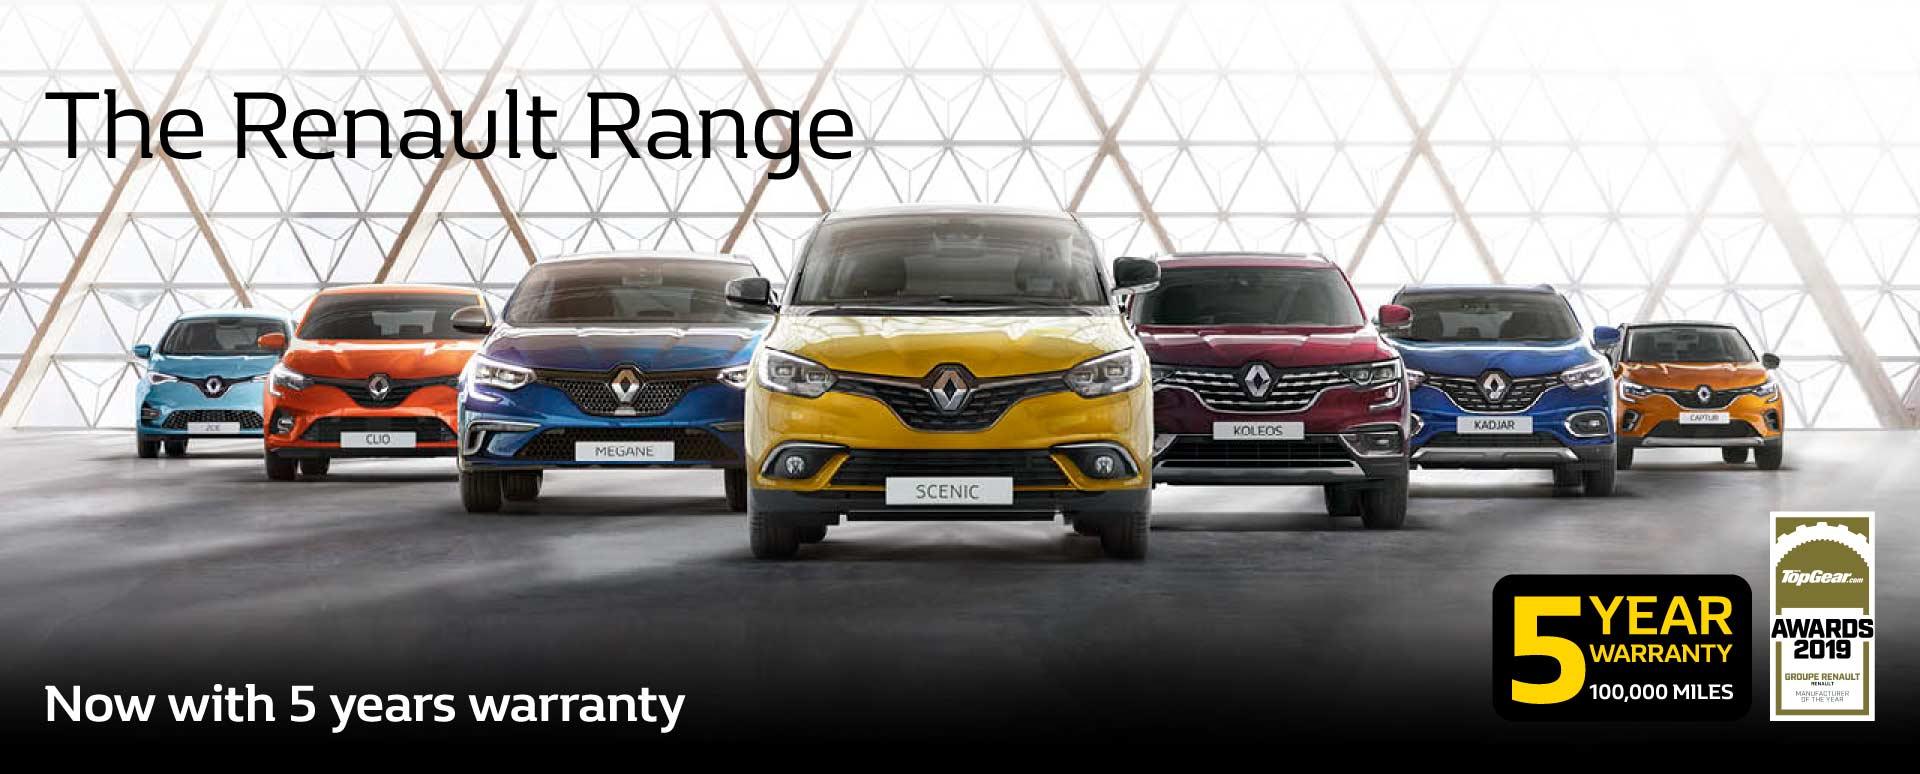 5 Year Renault Warranty